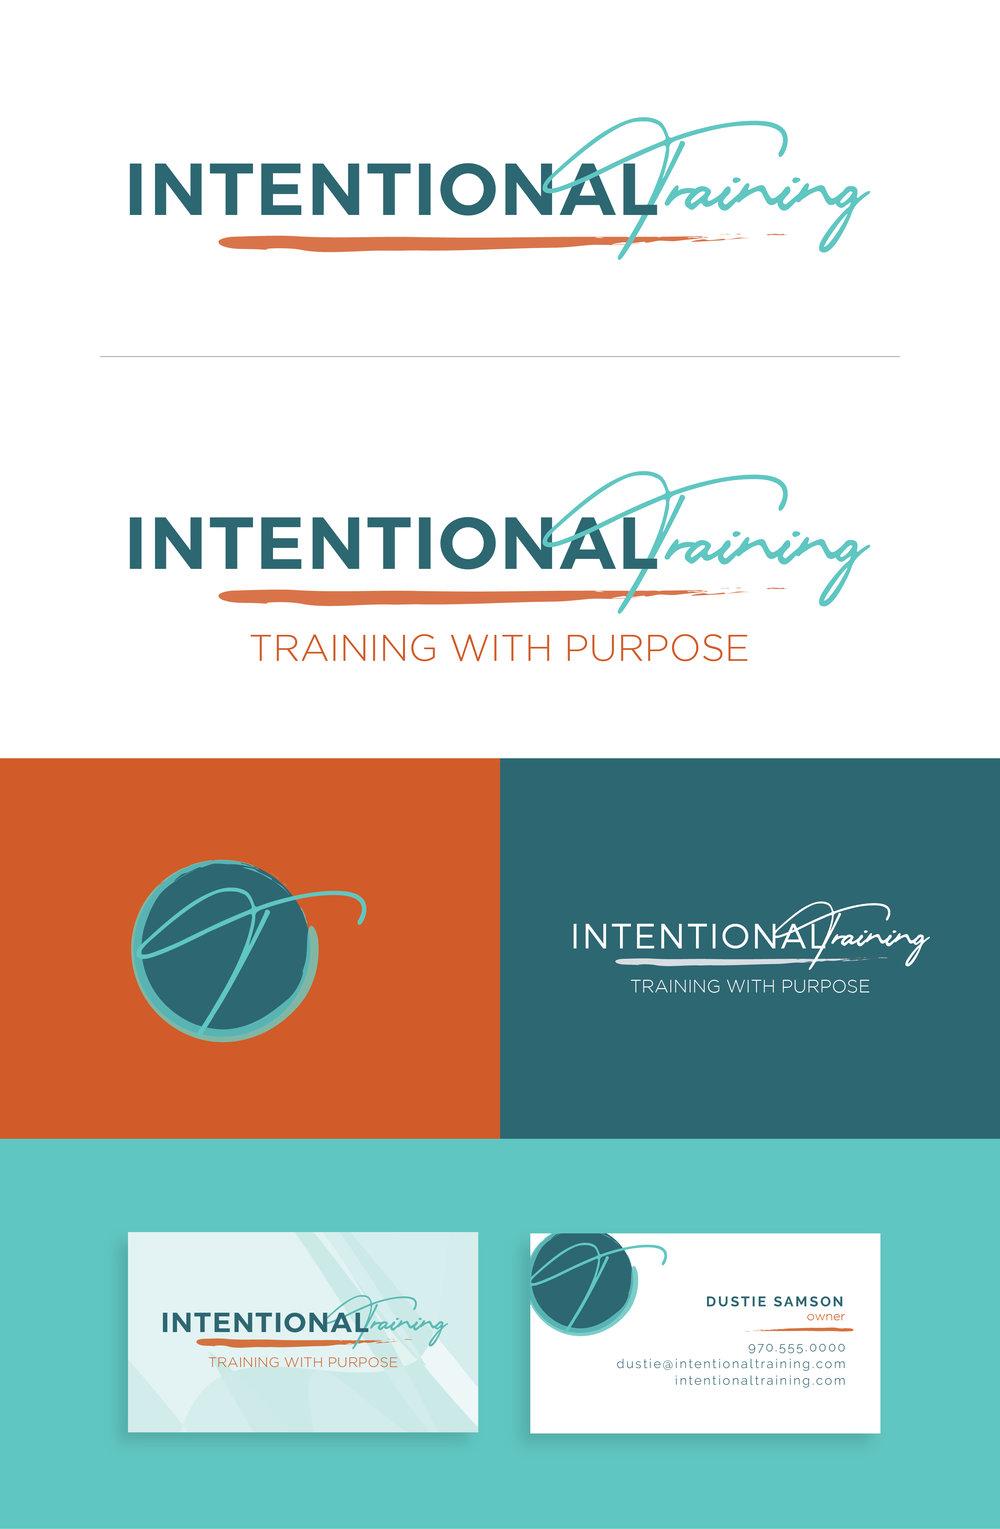 IntentionalTraining_FirstLook-01.jpg